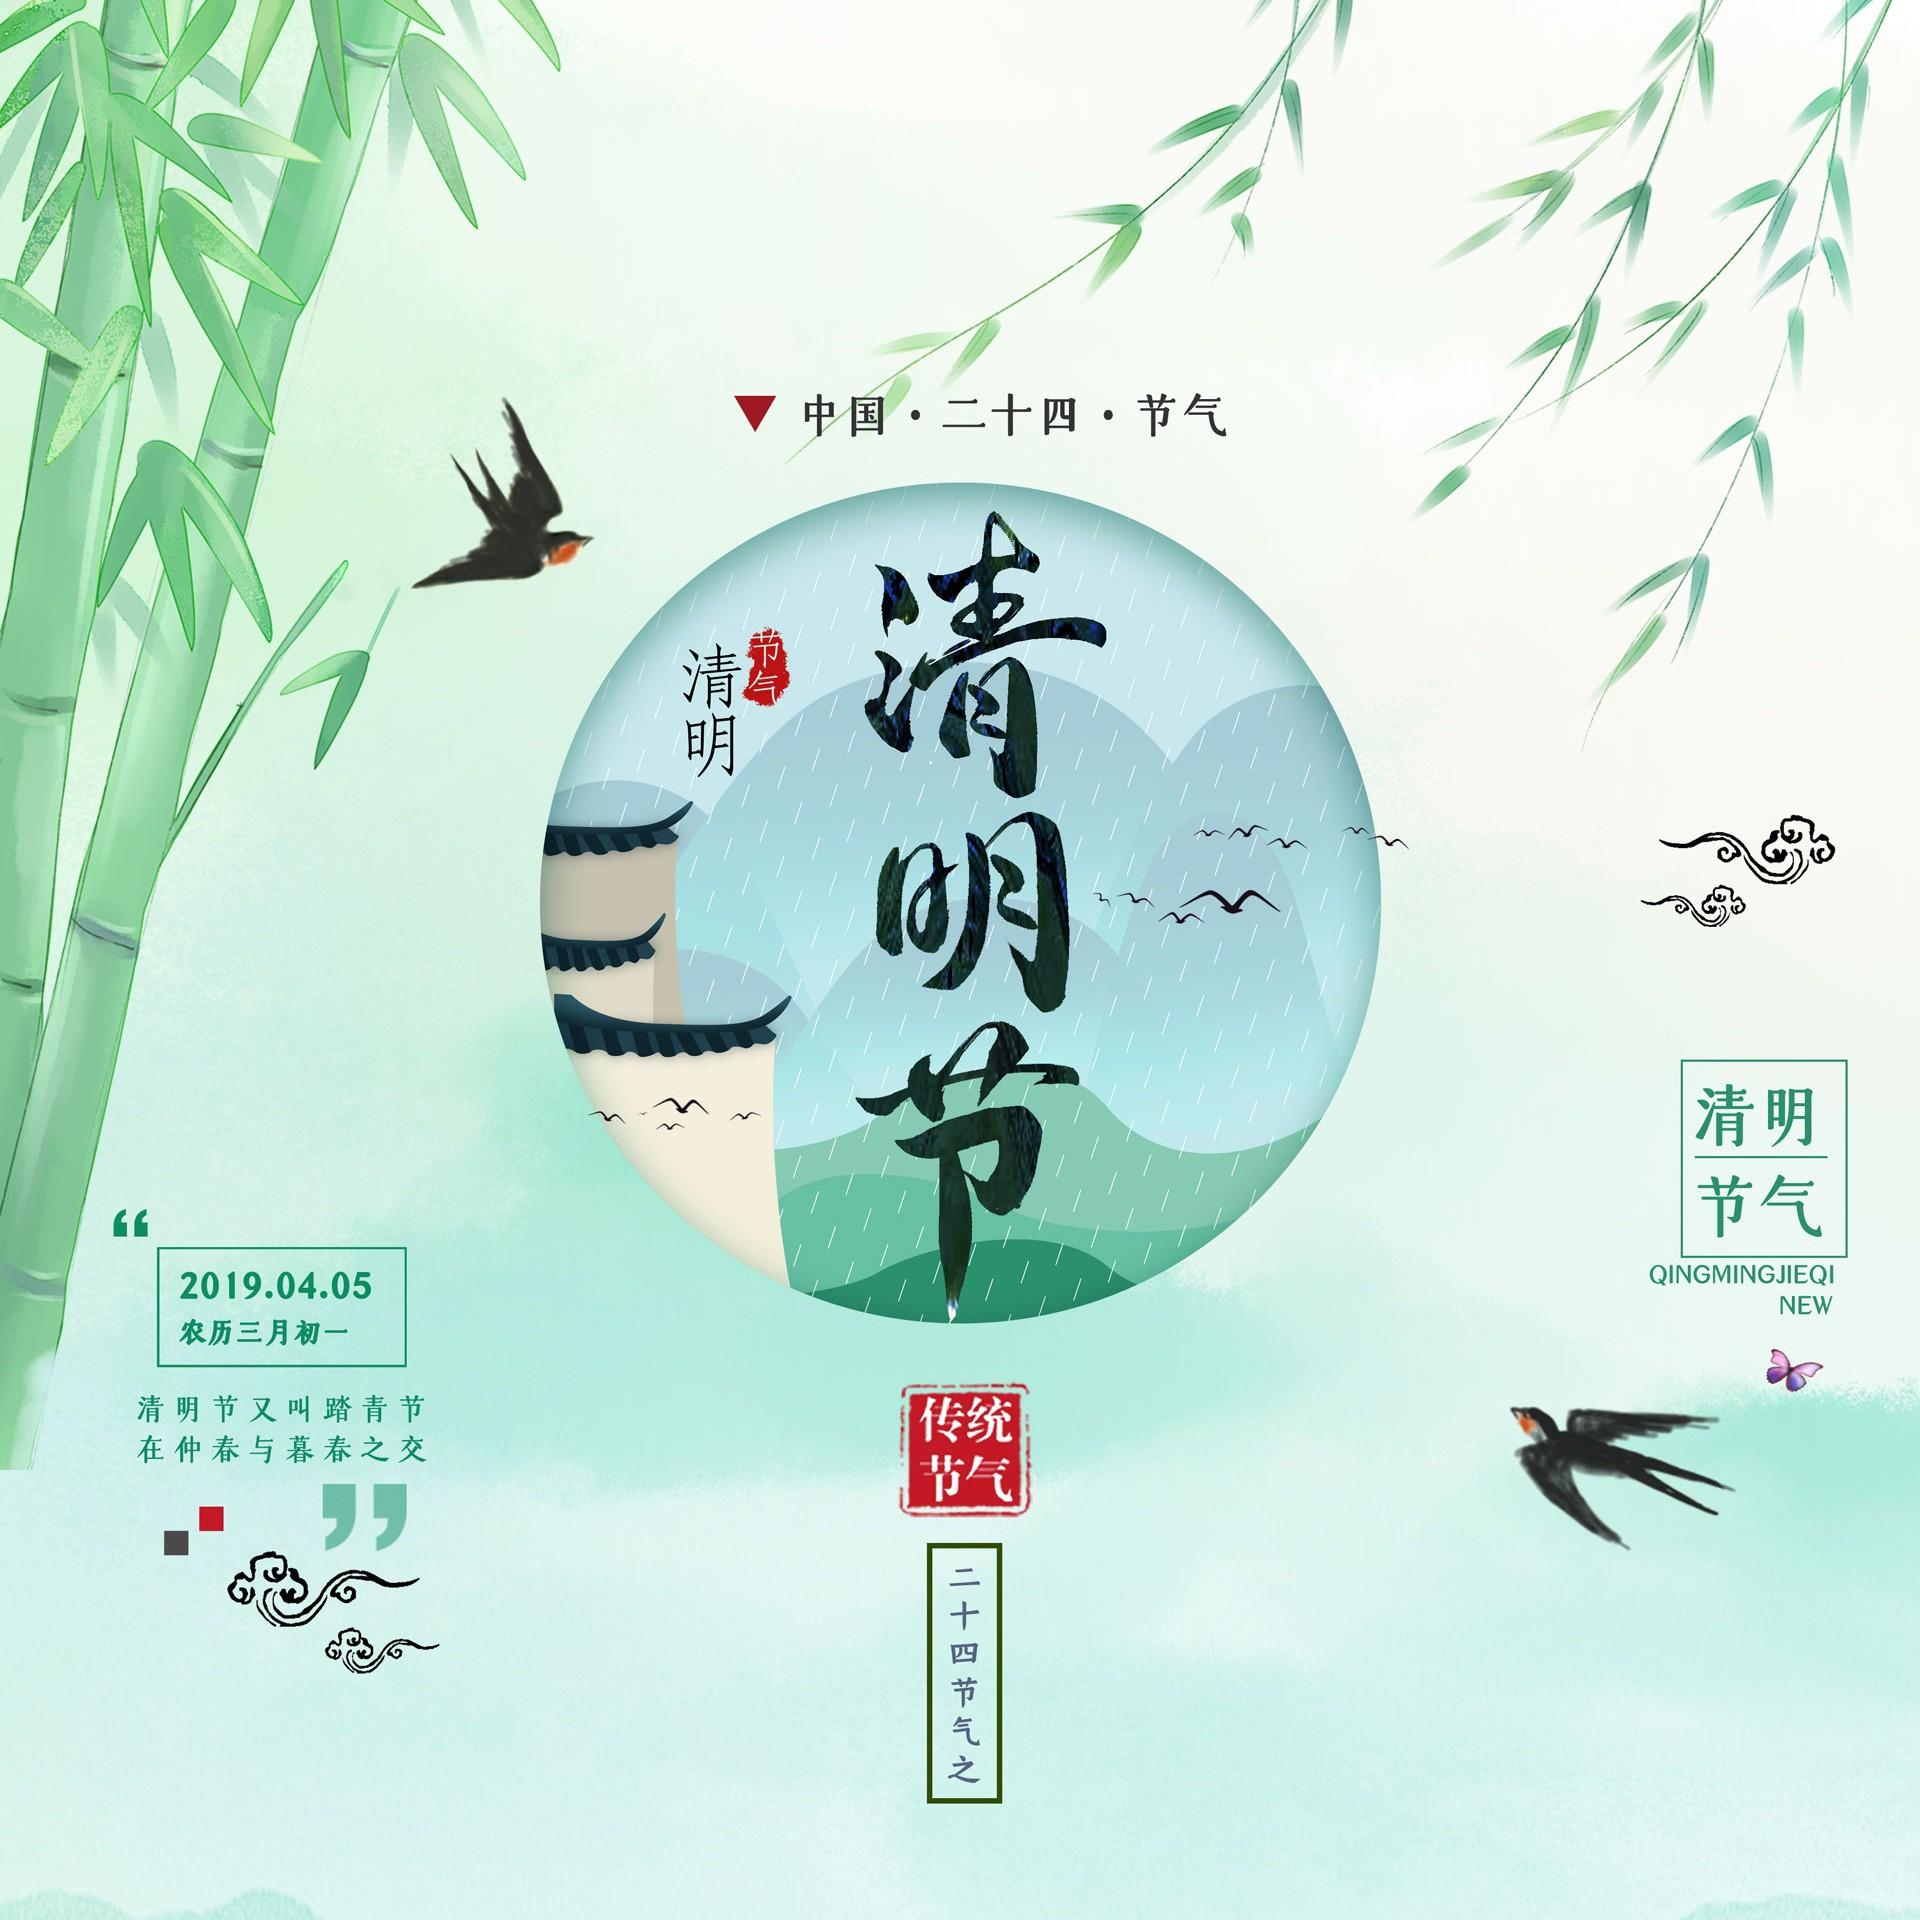 AG亚游集团2019年清明放假通知